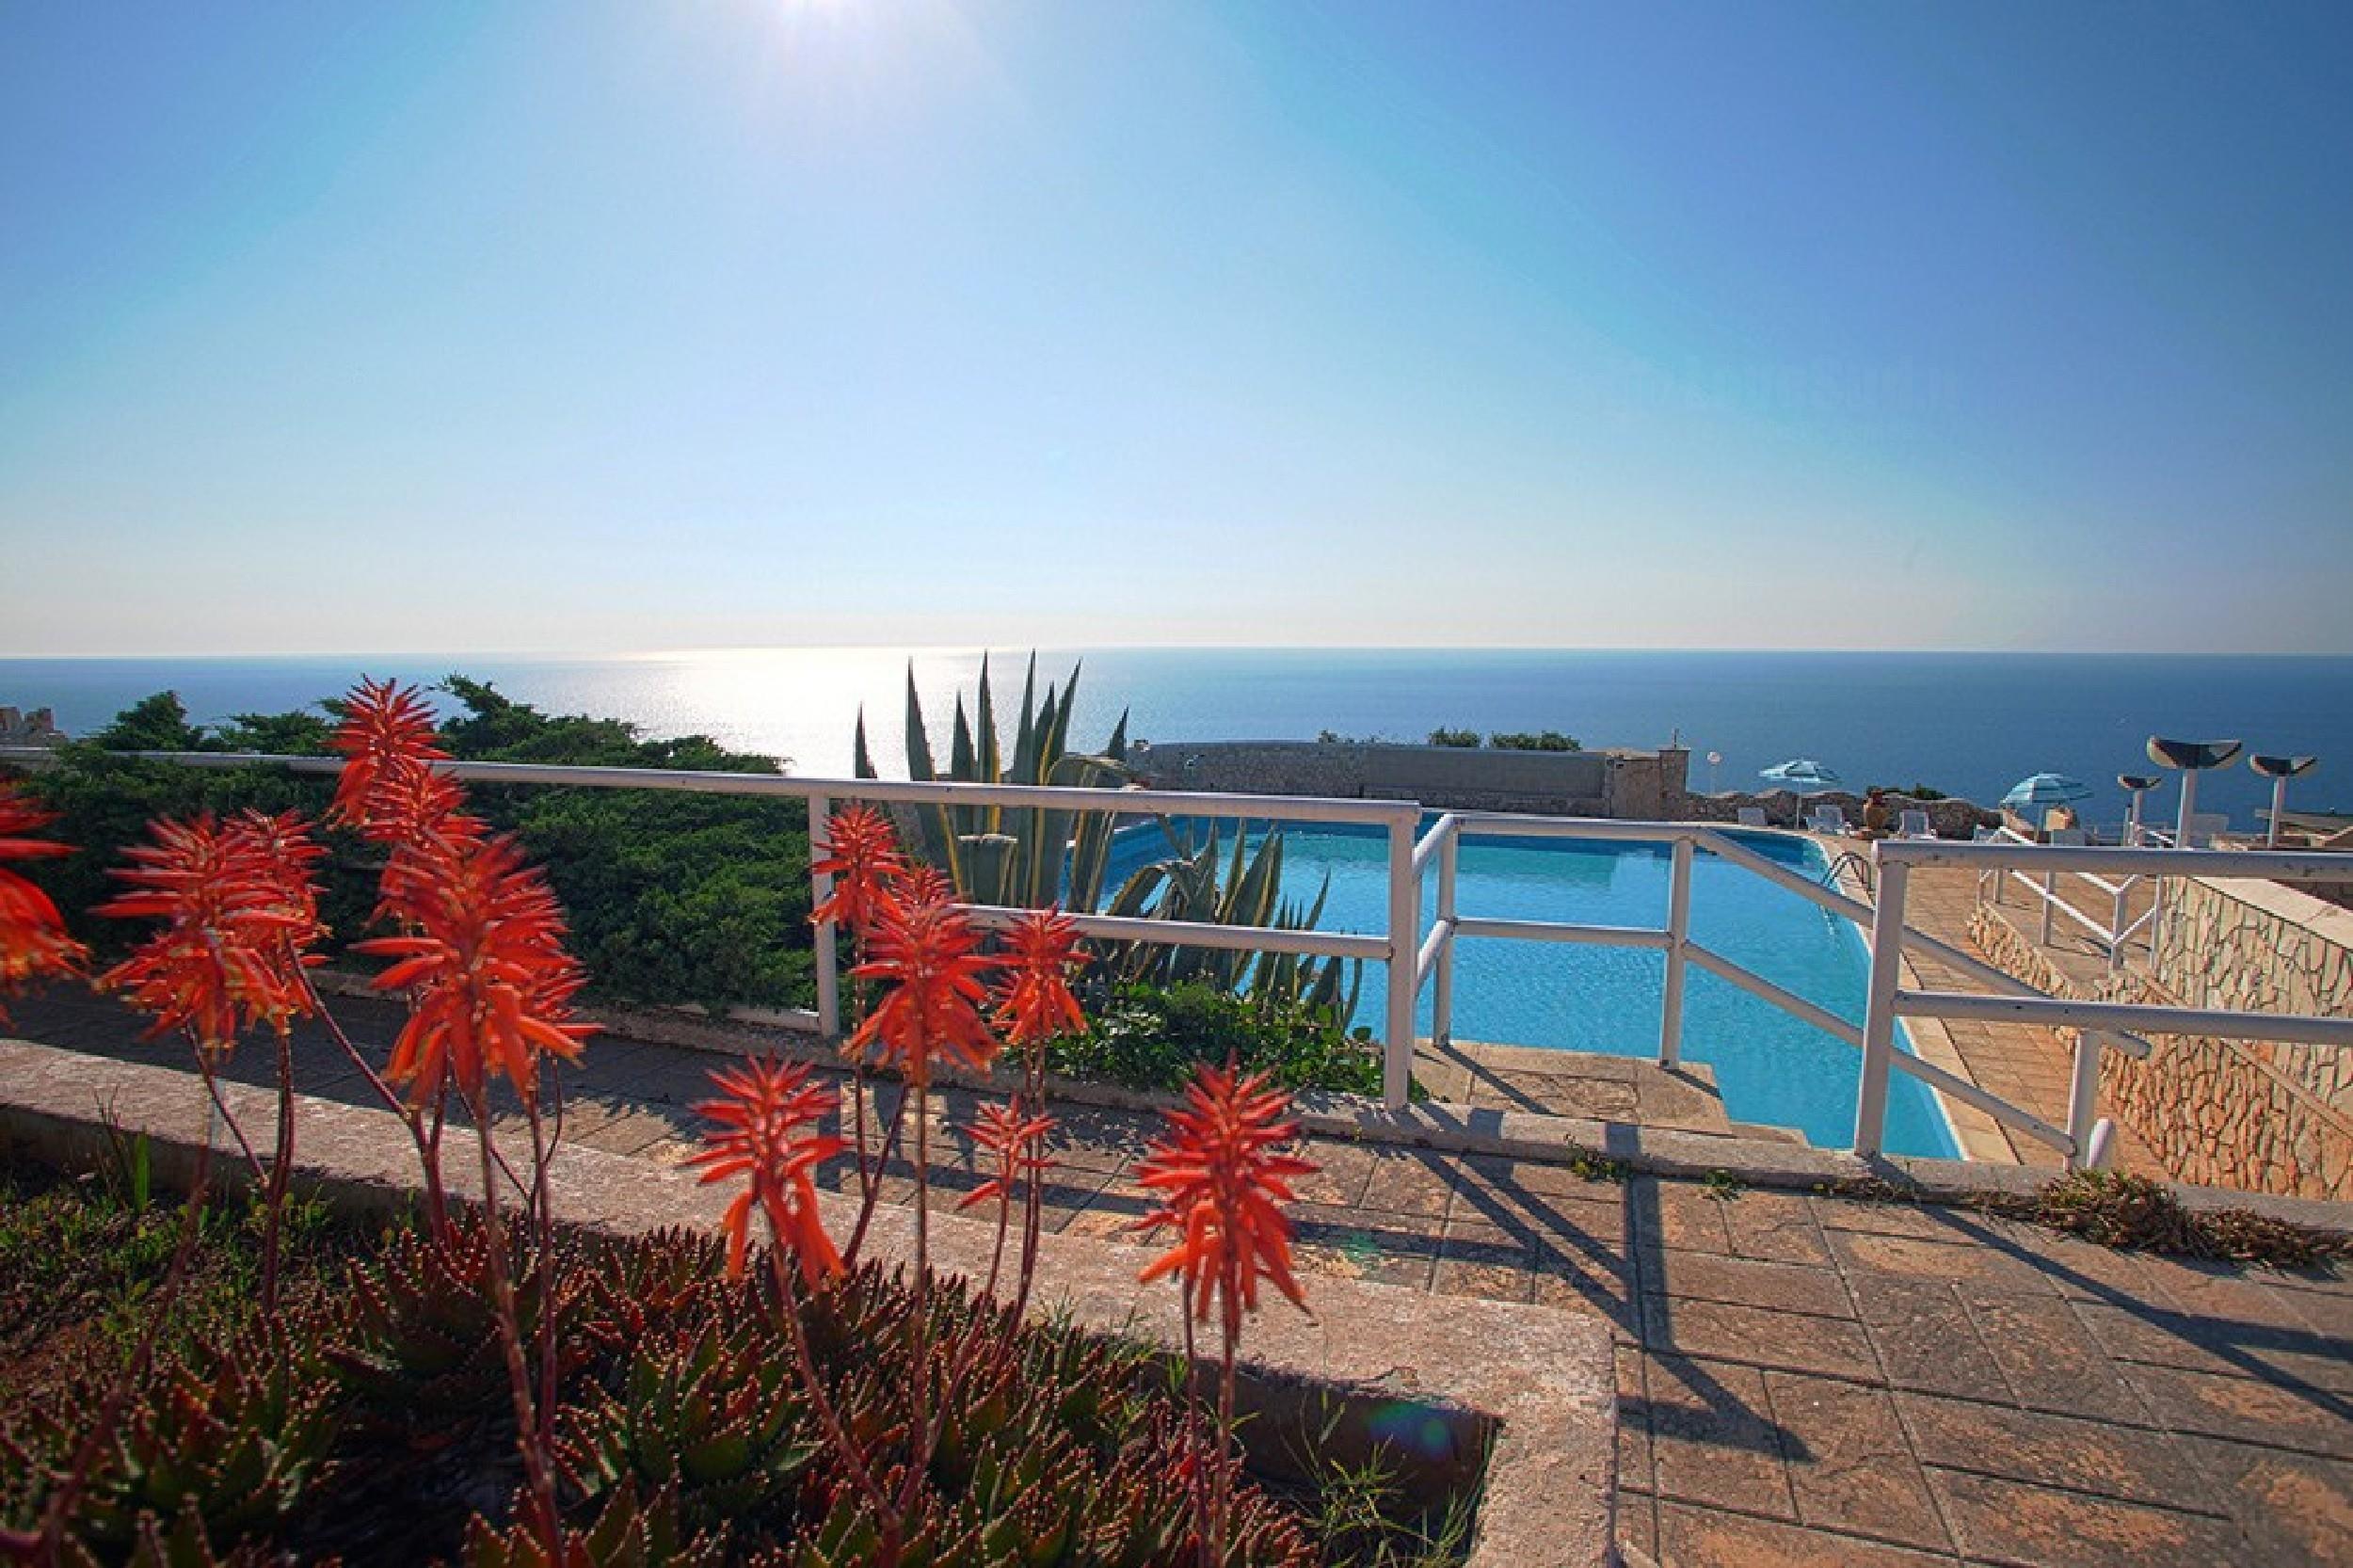 Apartment Archetti pool residence photo 22460064